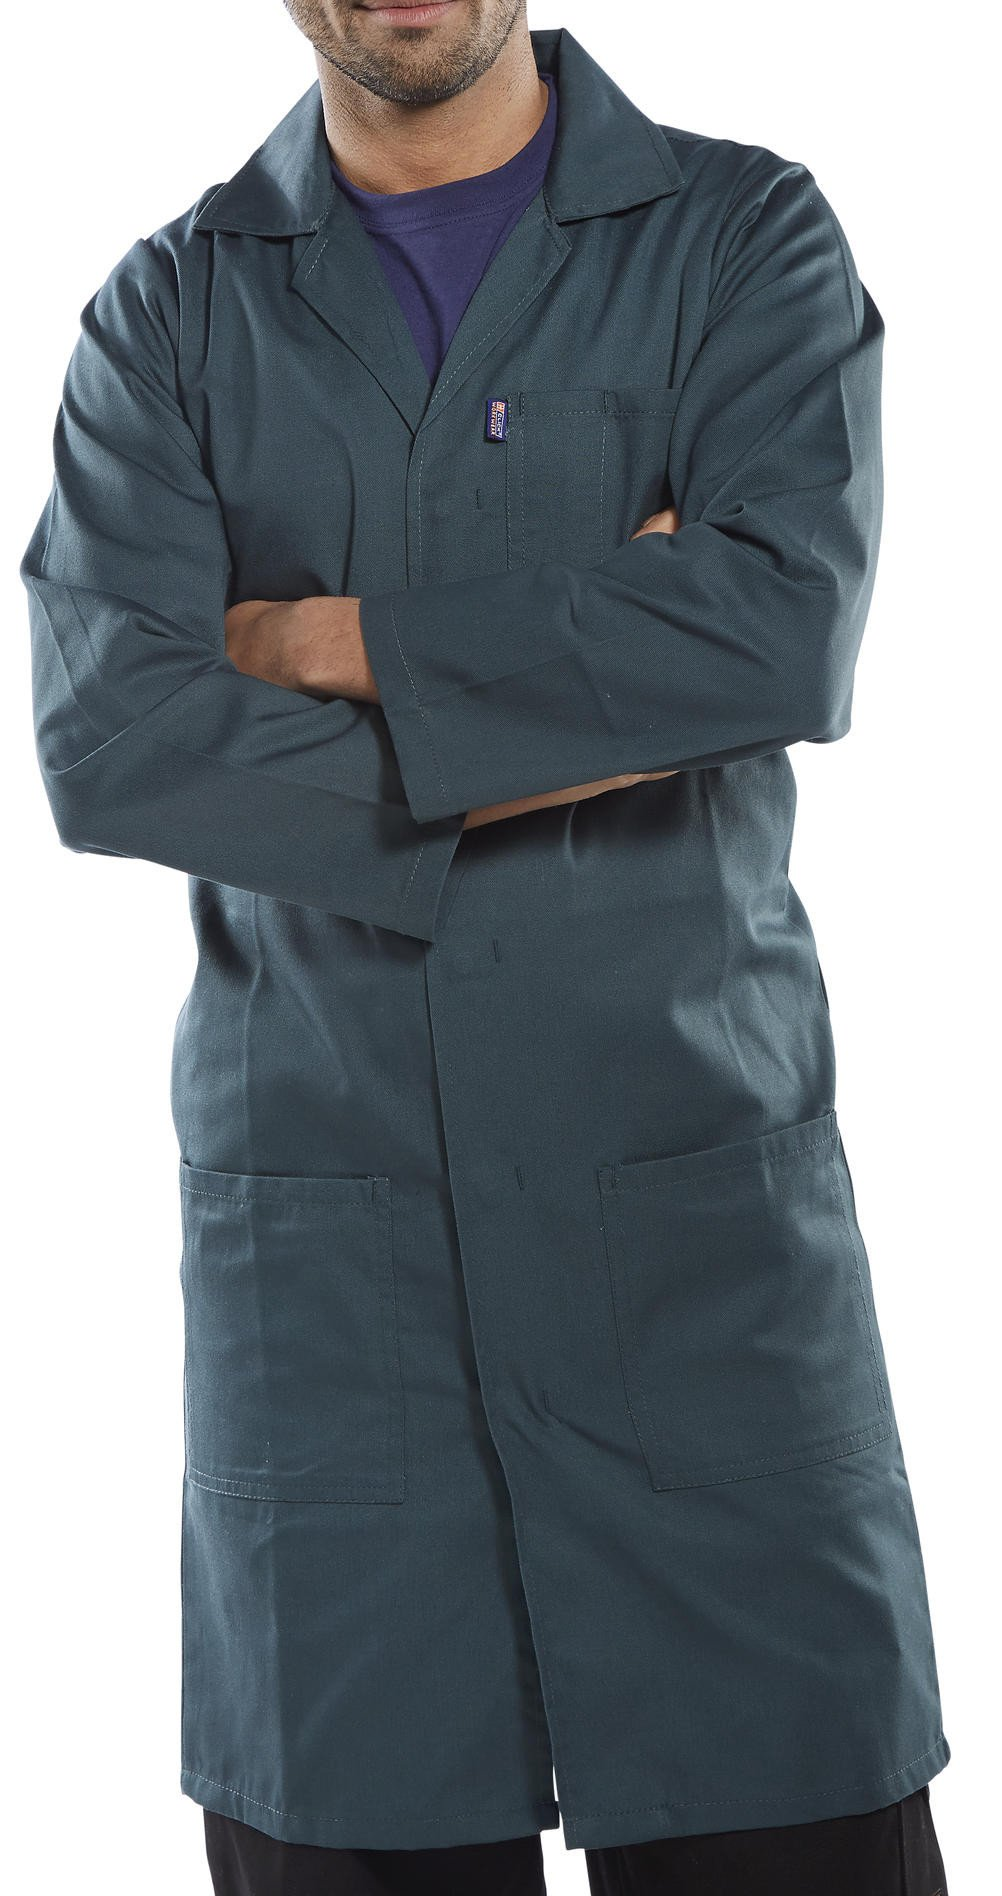 Warehouse Coat Janitorial Direct Ltd